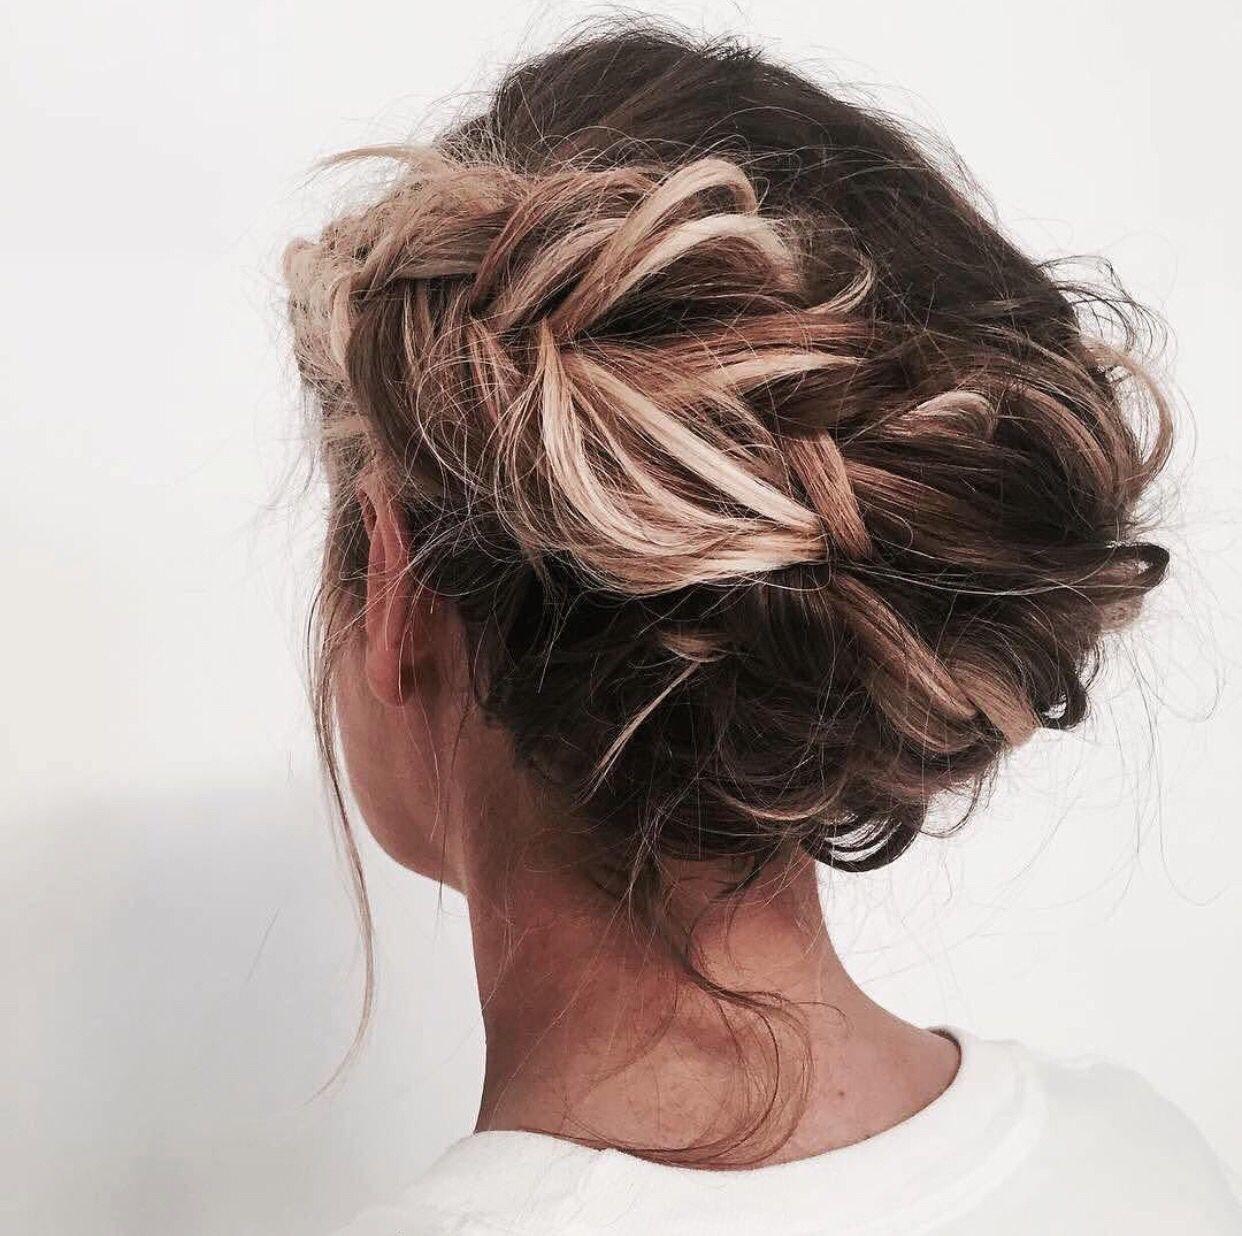 Pin By Maria Urbik On Hair Messy Hairstyles Boring Hair Hair Styles